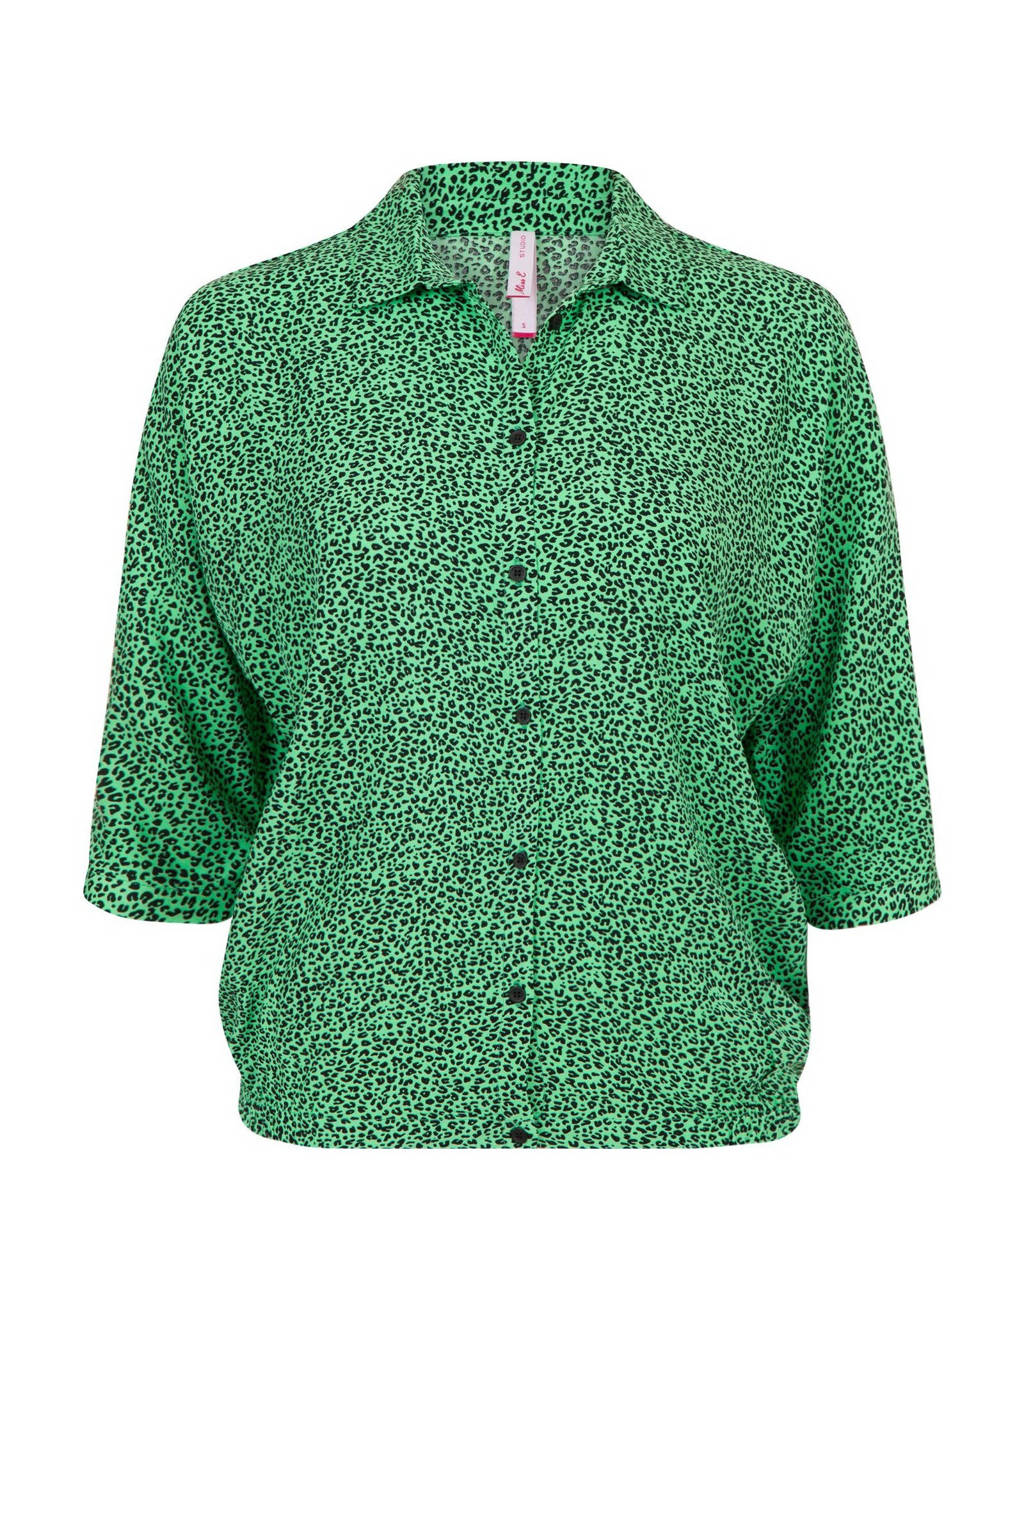 Miss Etam Regulier blouse met panterprint groen, Groen